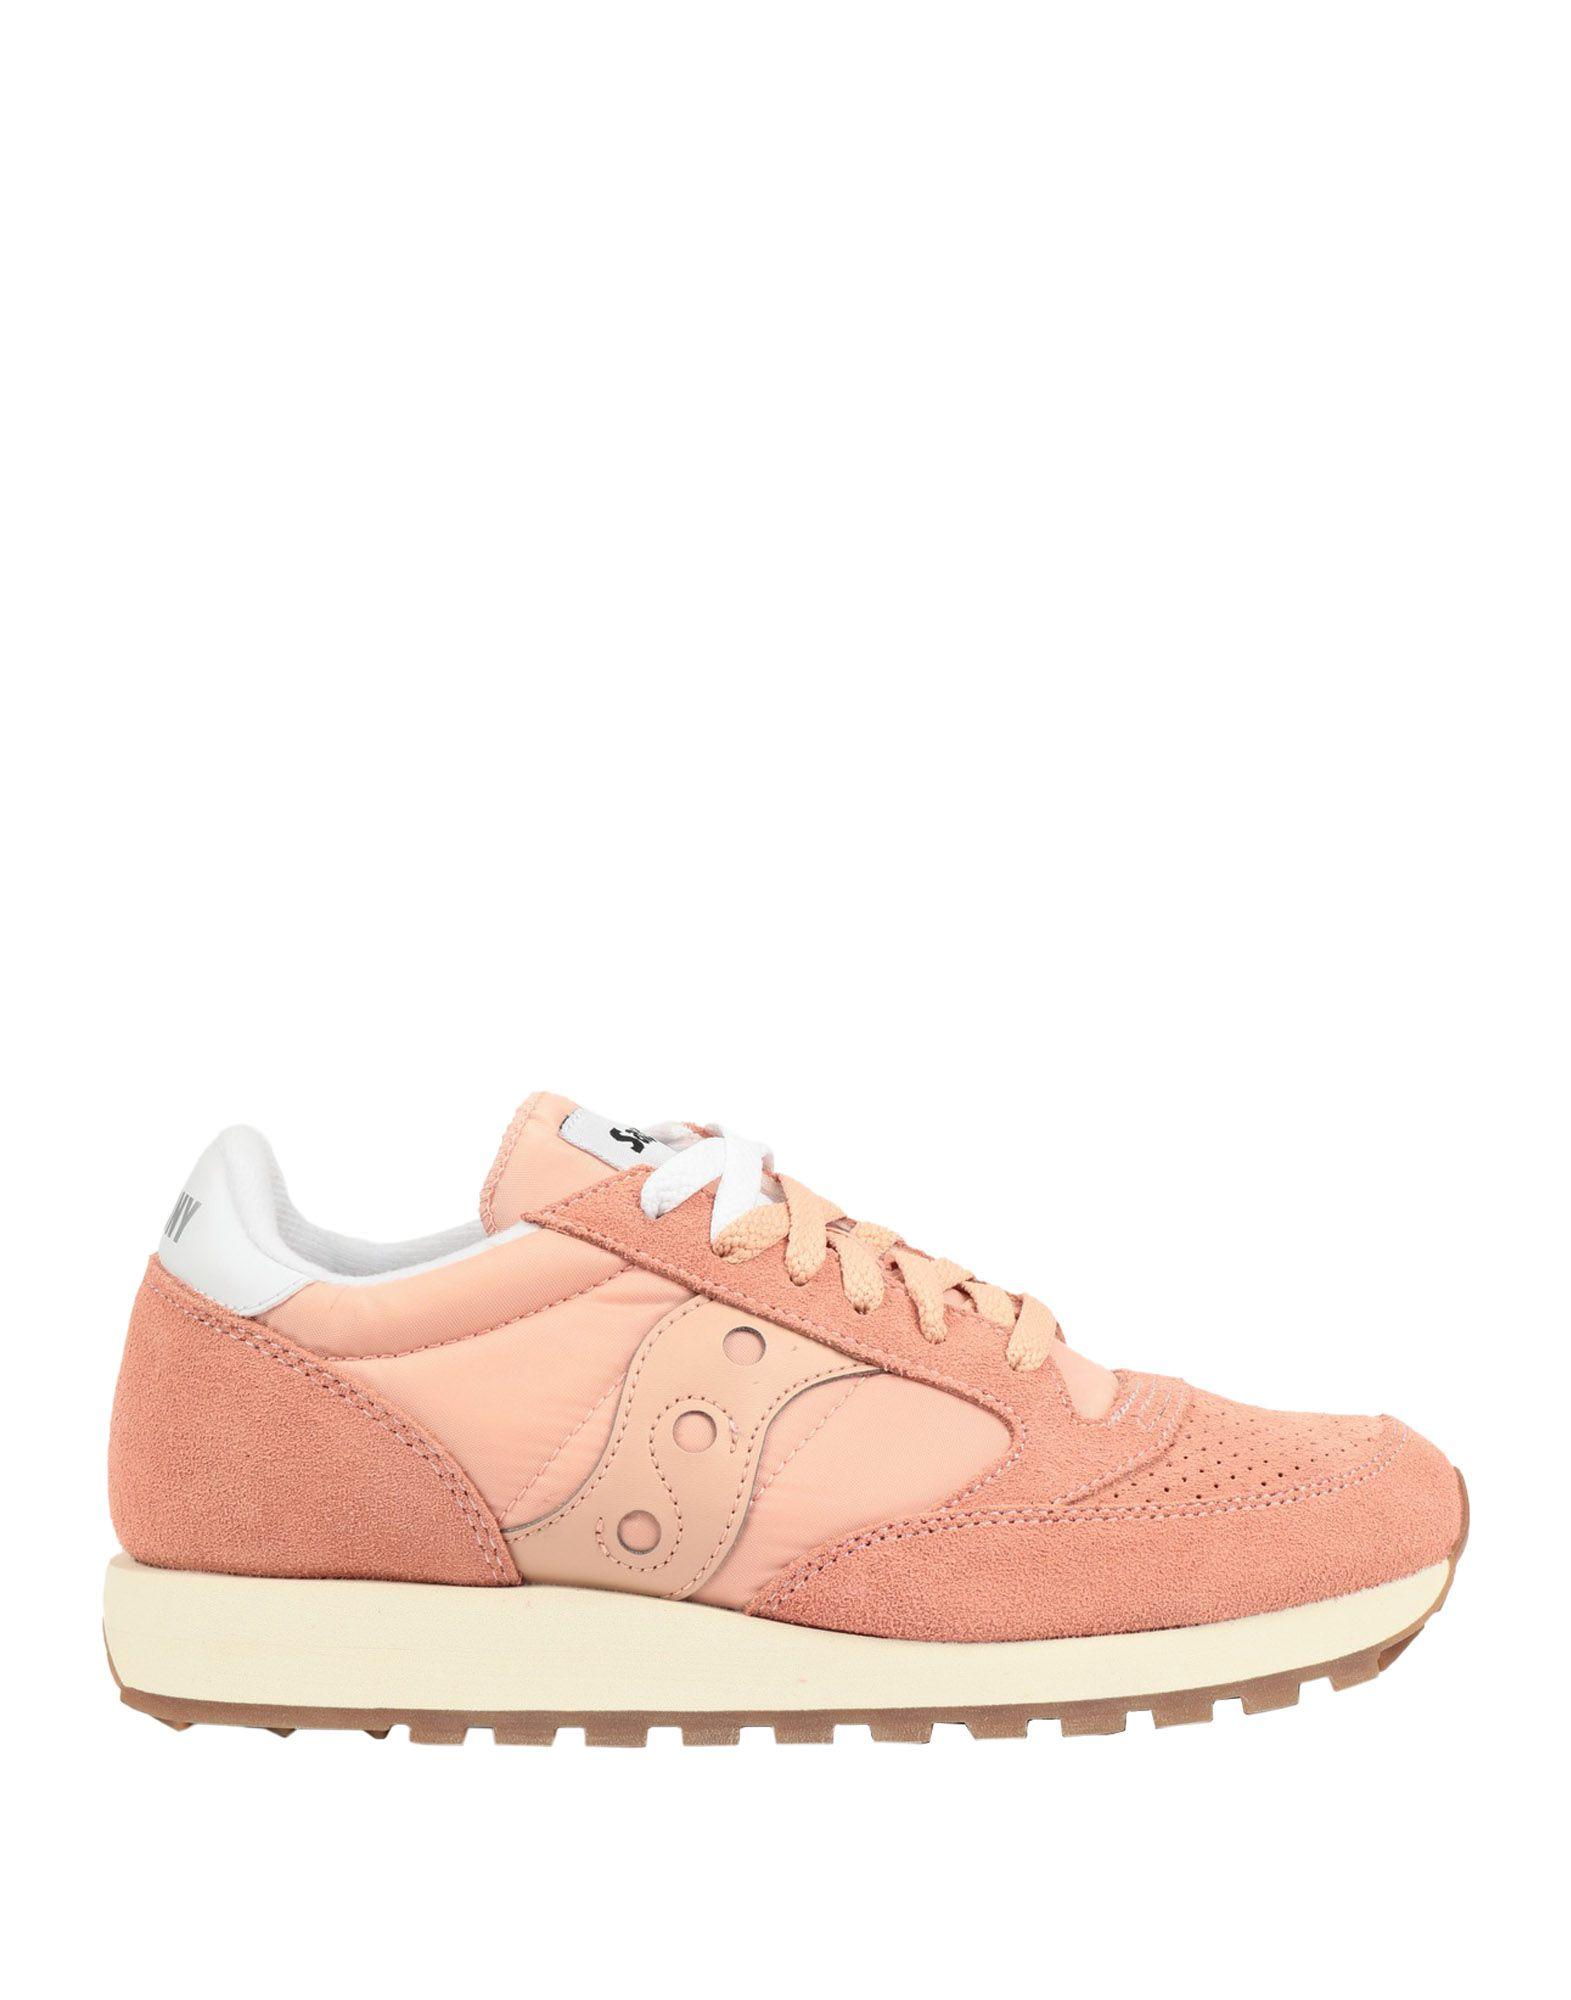 Saucony Jazz O Vintage Vintage Vintage Suede W - Sneakers - Women Saucony Sneakers online on  United Kingdom - 11575584VW 6687ee